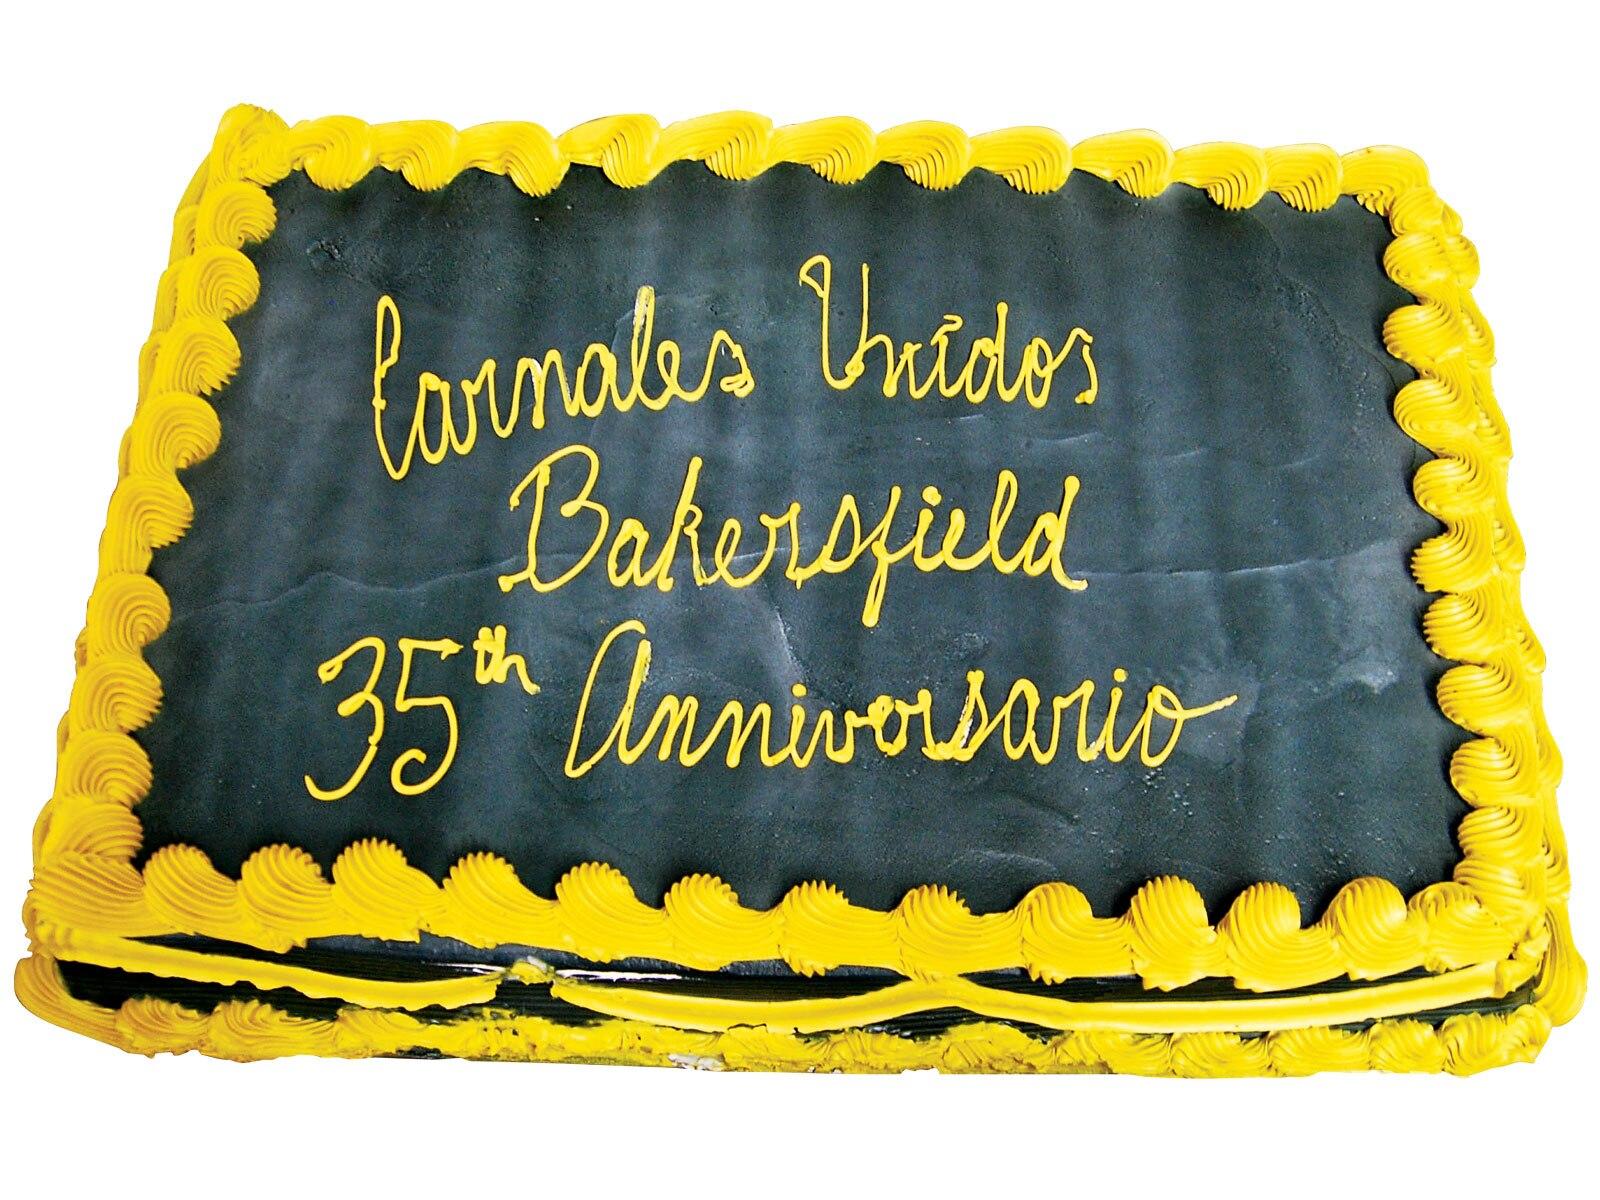 1009_lrmp_01_z-carnales_unidos_car_club-cake2